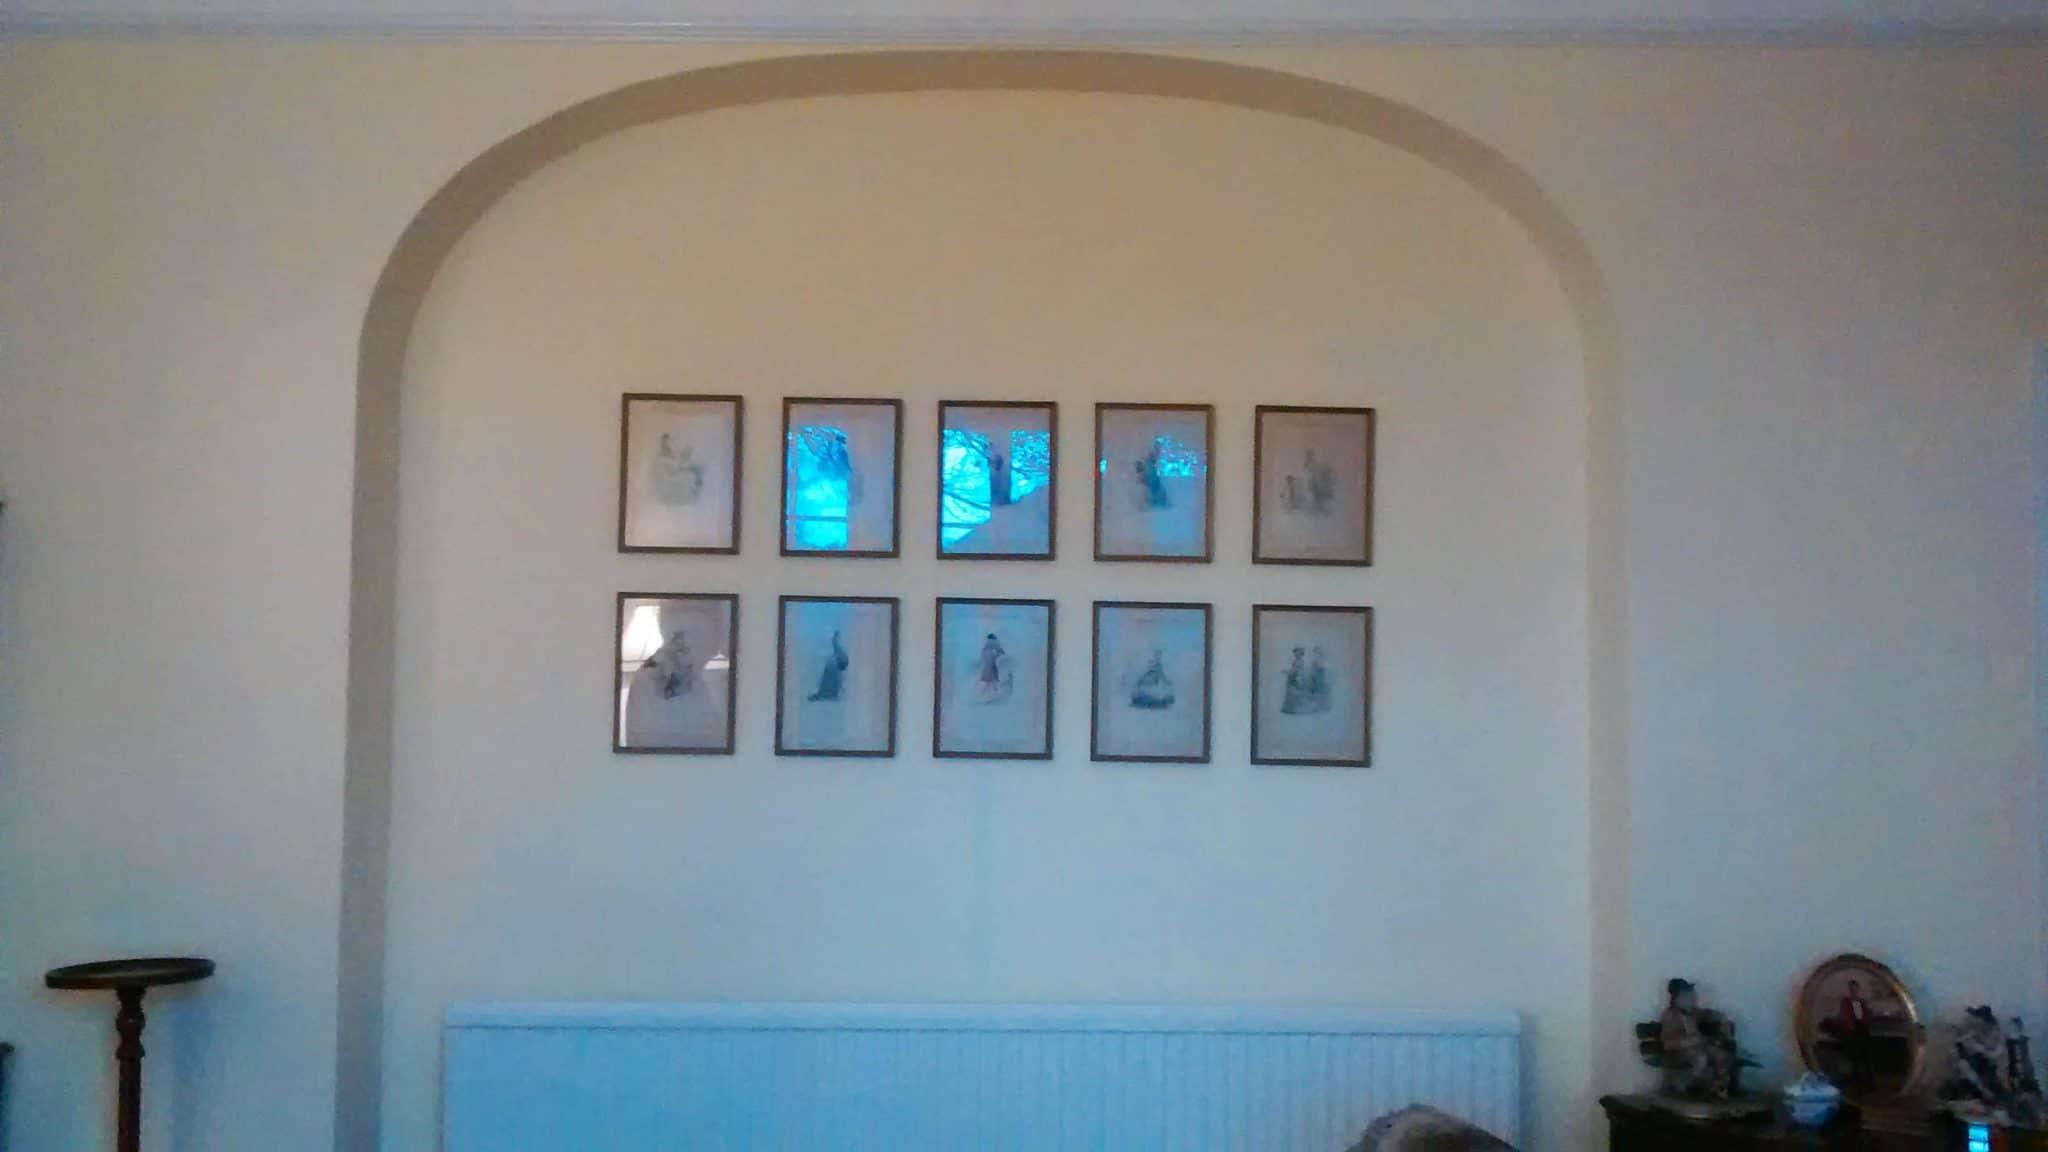 A grid of ten victorian watercolour illustrations hung in Lamberhurst, Tunbridge Wells.